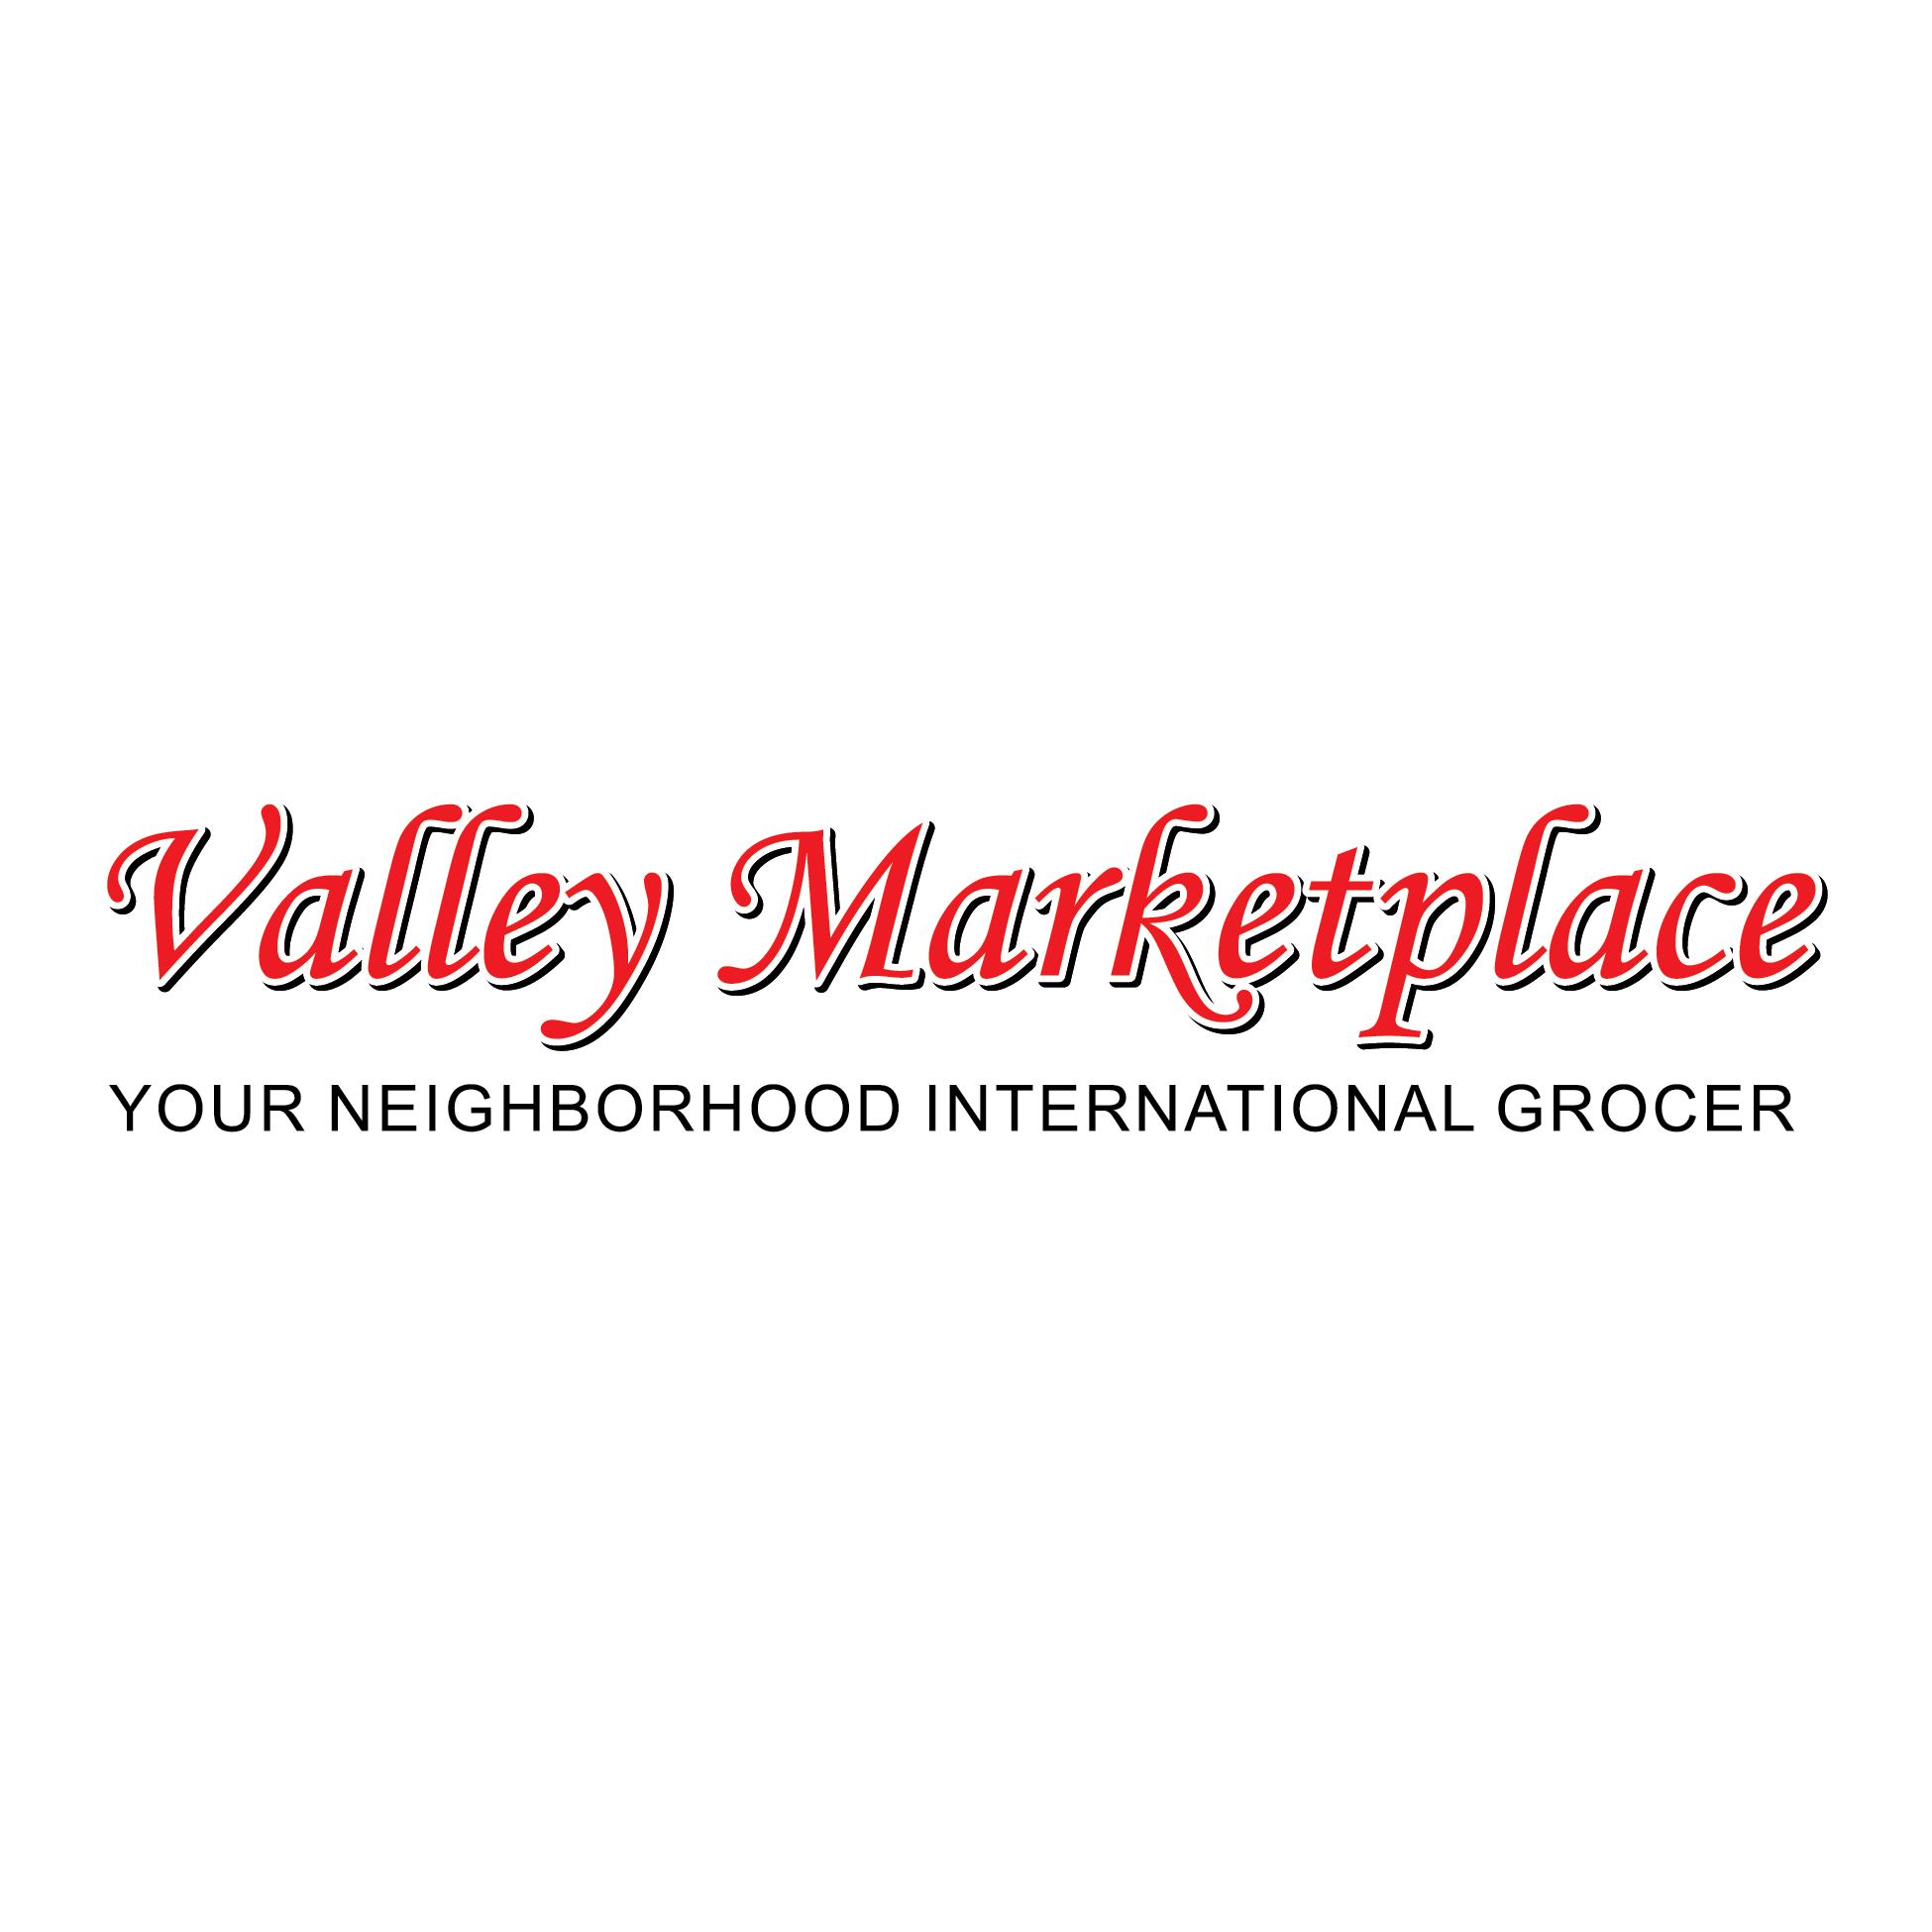 Valley Marketplace logo